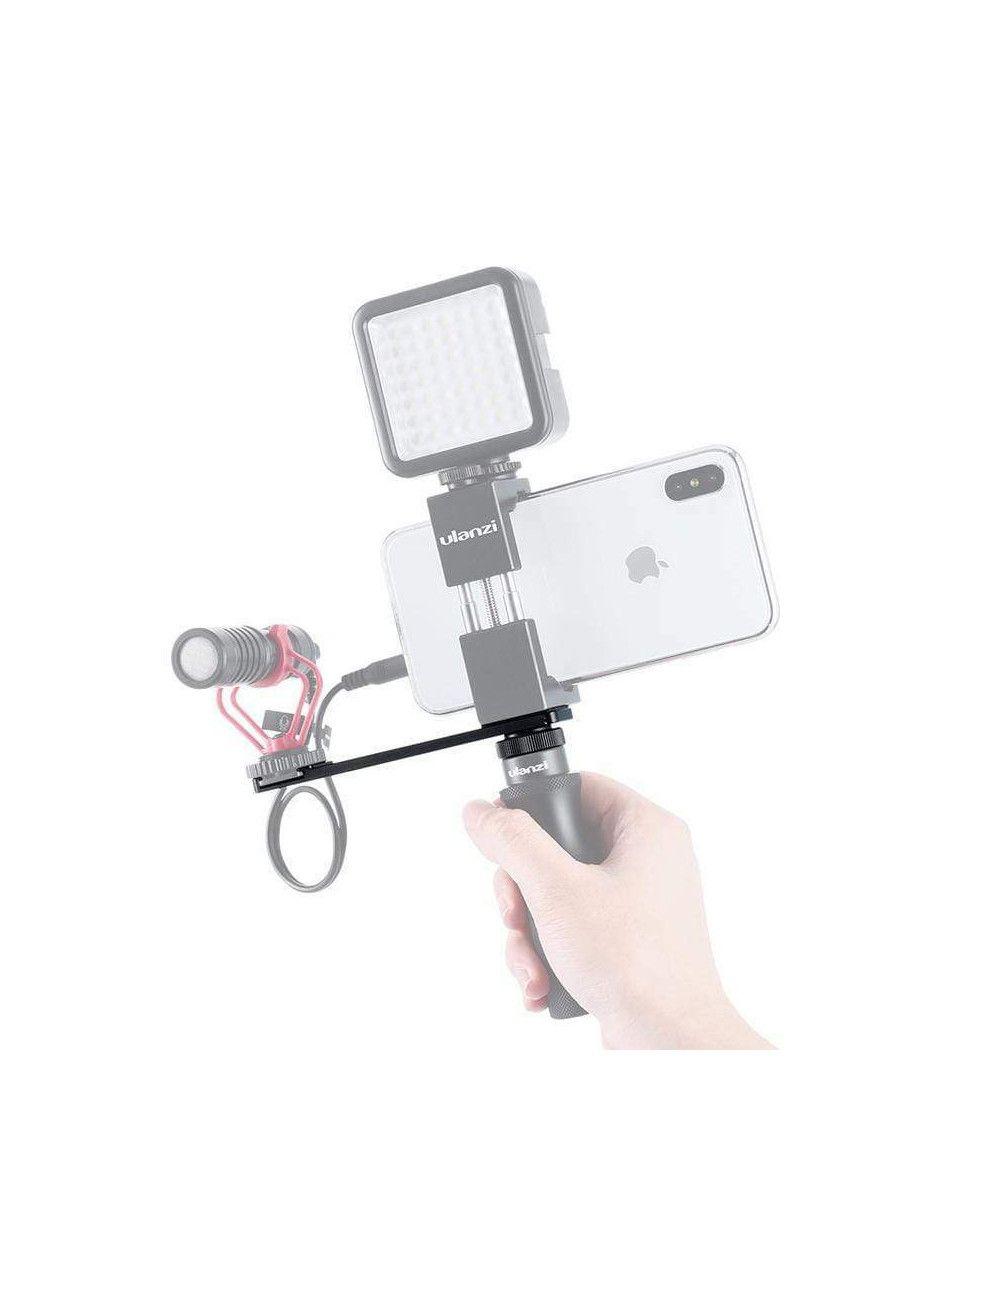 Yongnuo YN720 Flash con Batería Recargable de Litio para Canon Nikon Sony Pentax y Panasonic